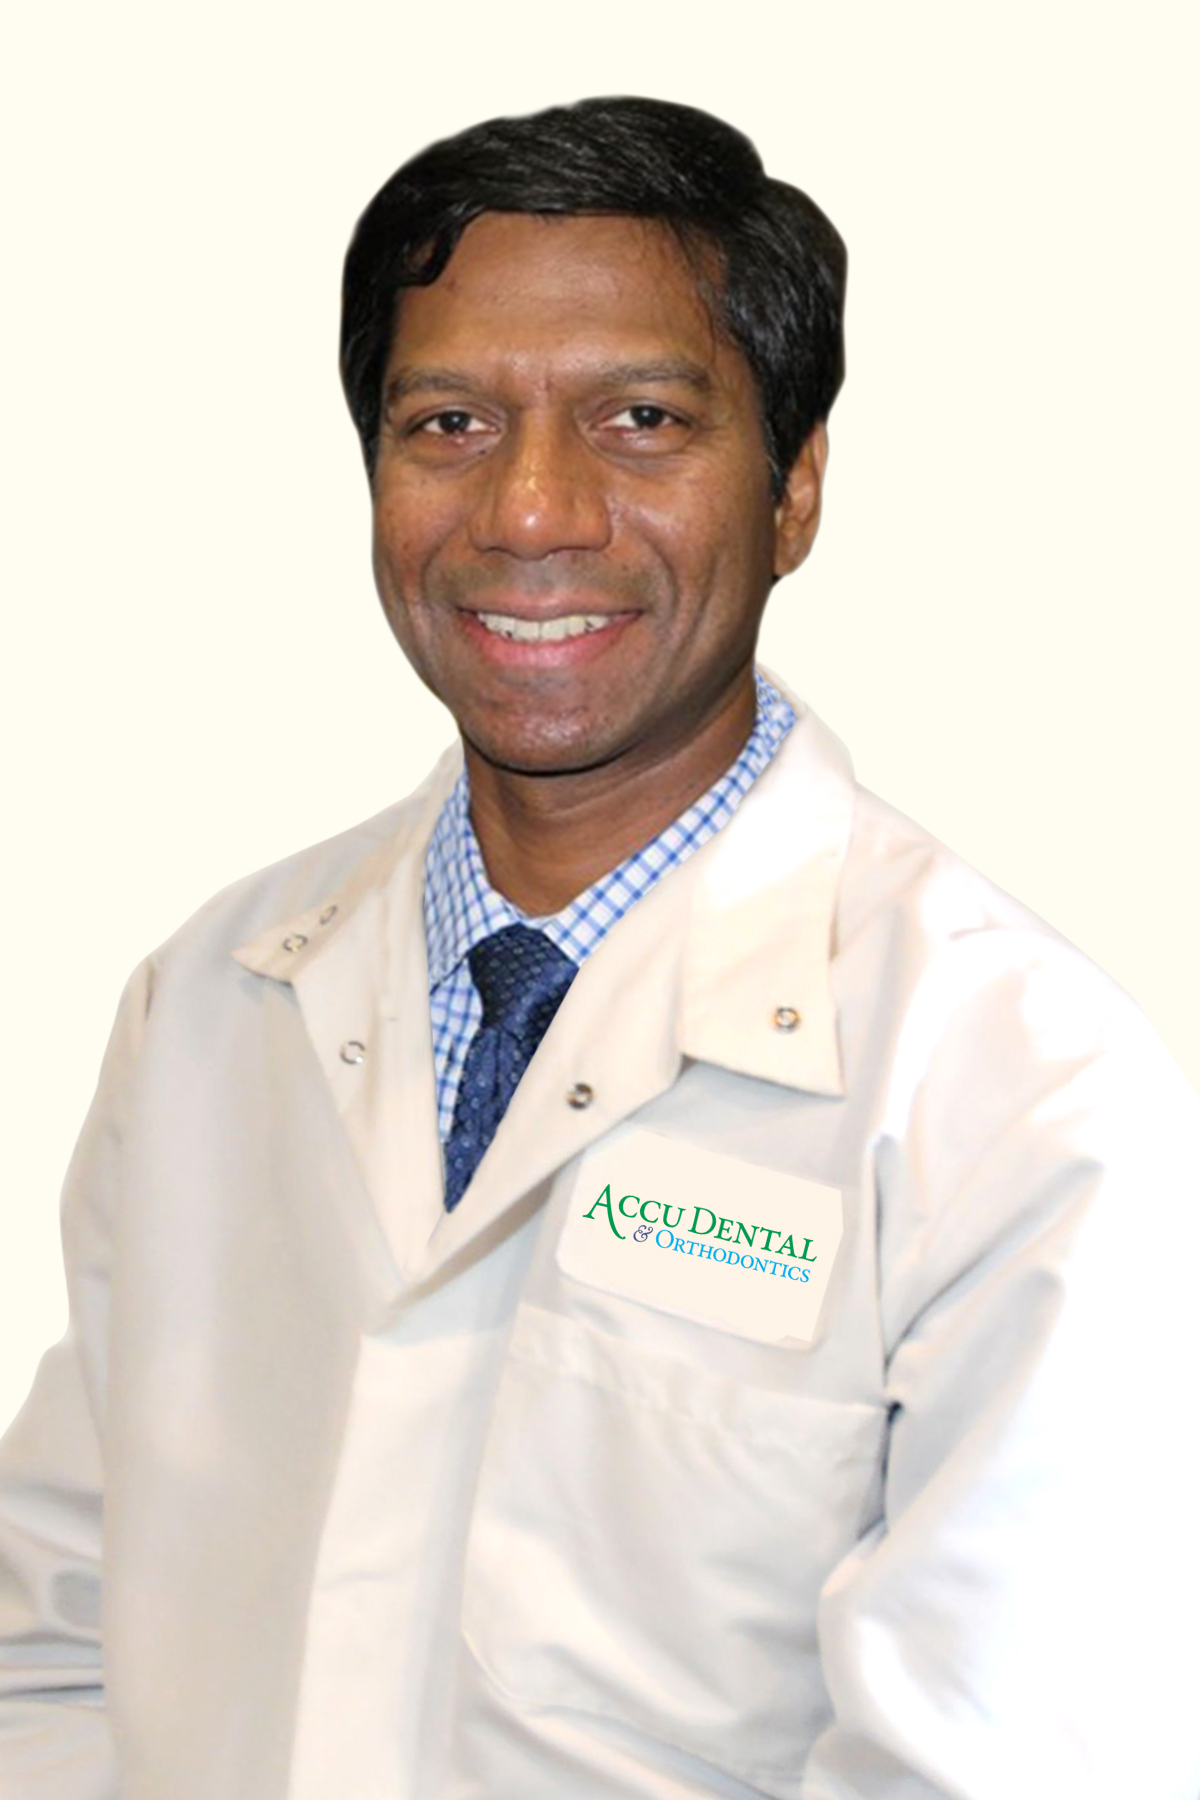 DR-KHALED